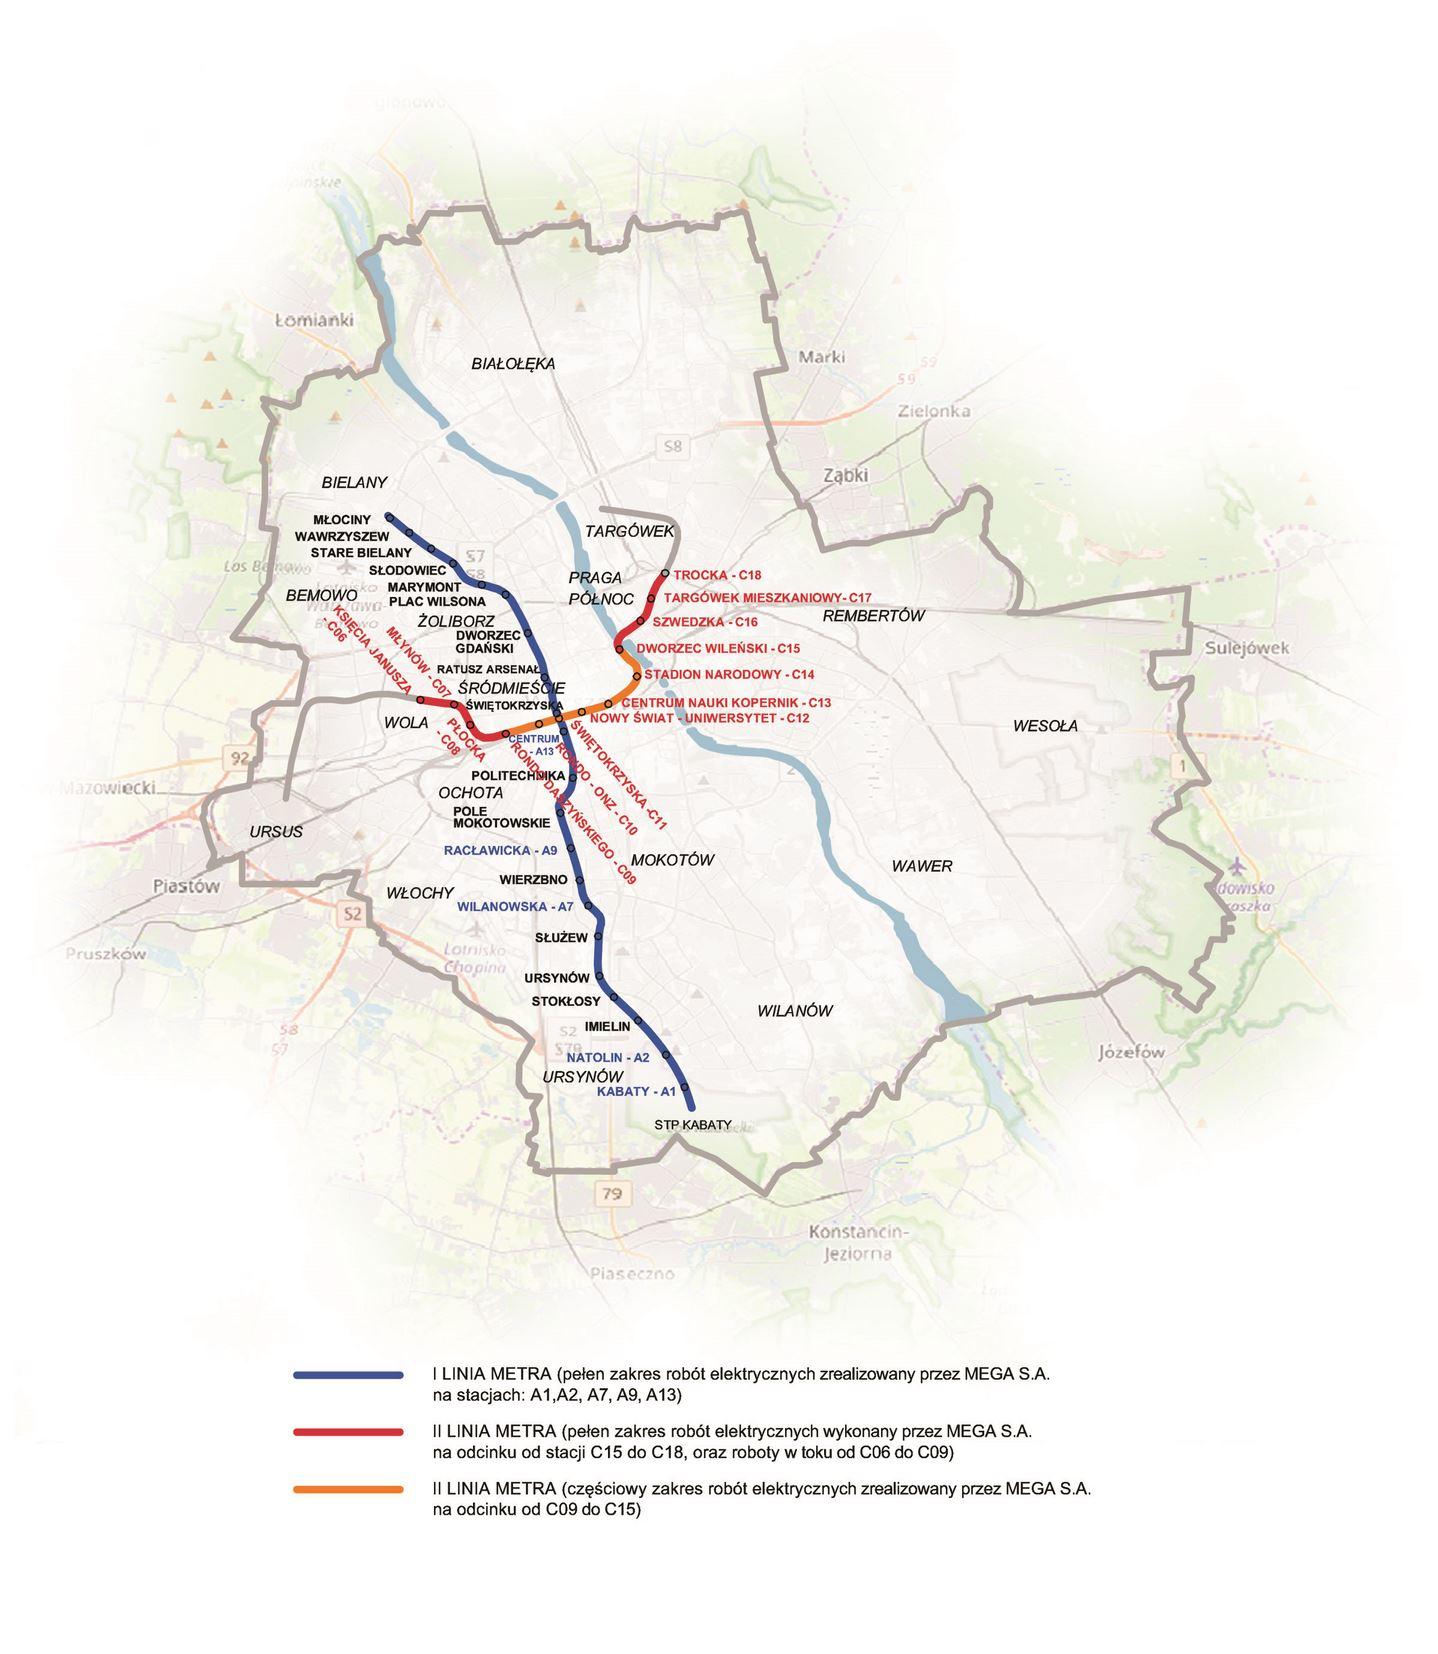 mapa METRO_W-wa01_JPG-Model copy sml